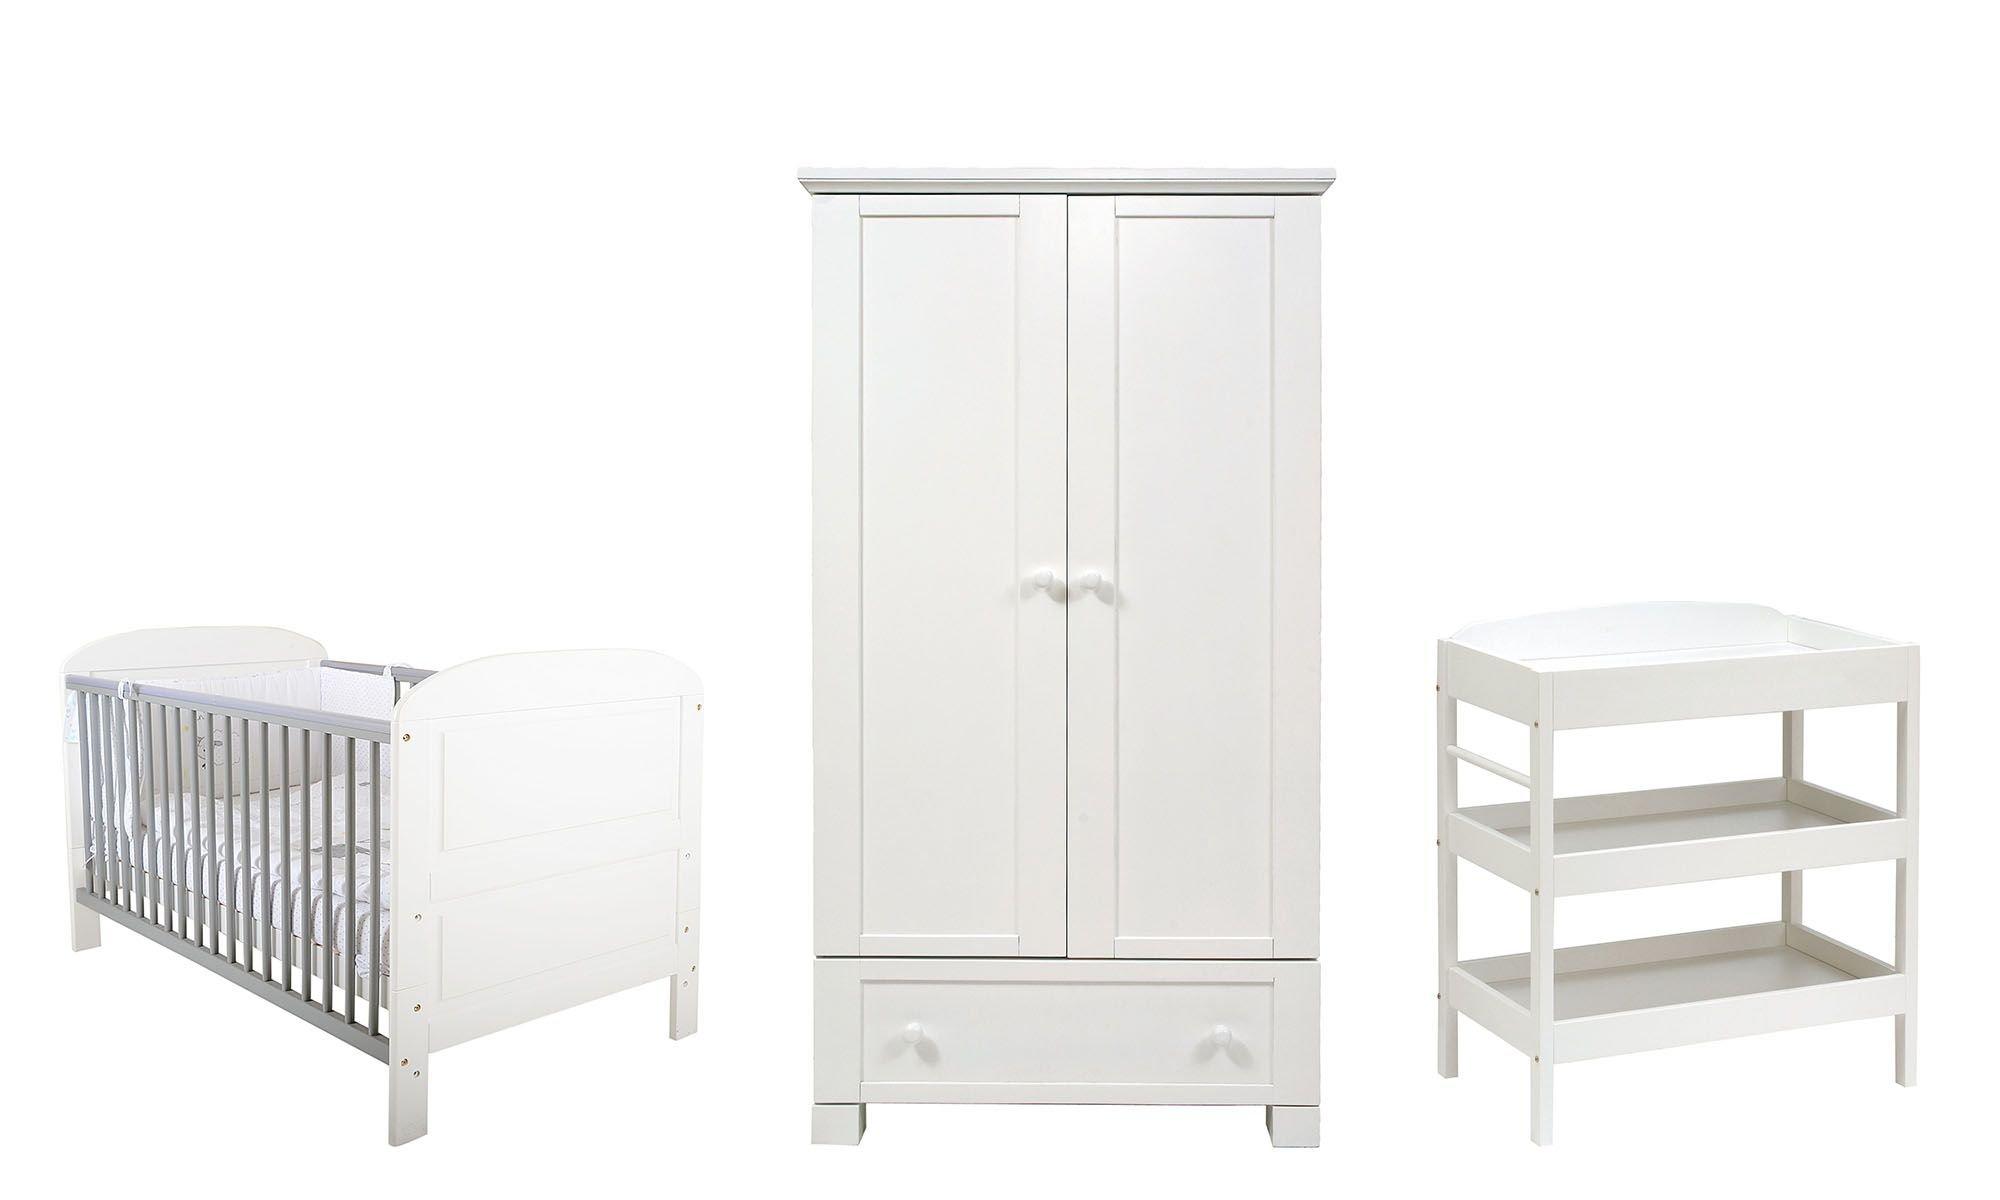 East Coast Nursery Furniture Set, 7464CM, 3-Piece East Coast Nursery Ltd Angelina cot bed Clara dresser Montreal wardrobe 1